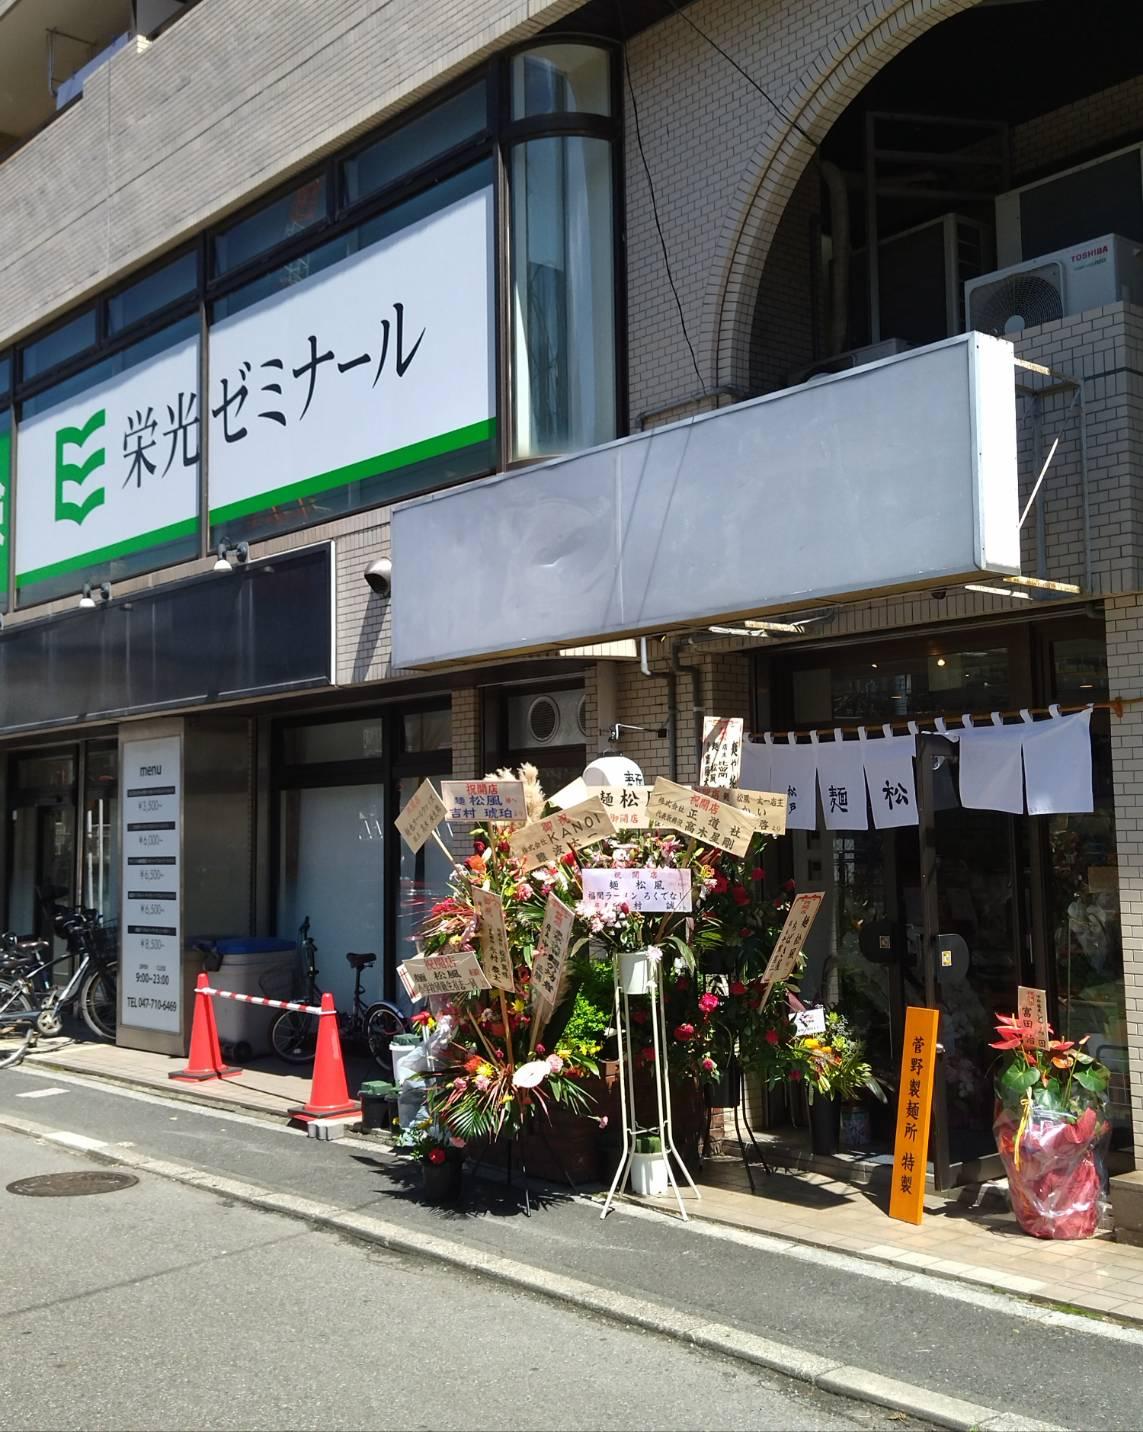 麺 松風 博多豚骨ラーメン松戸駅東口